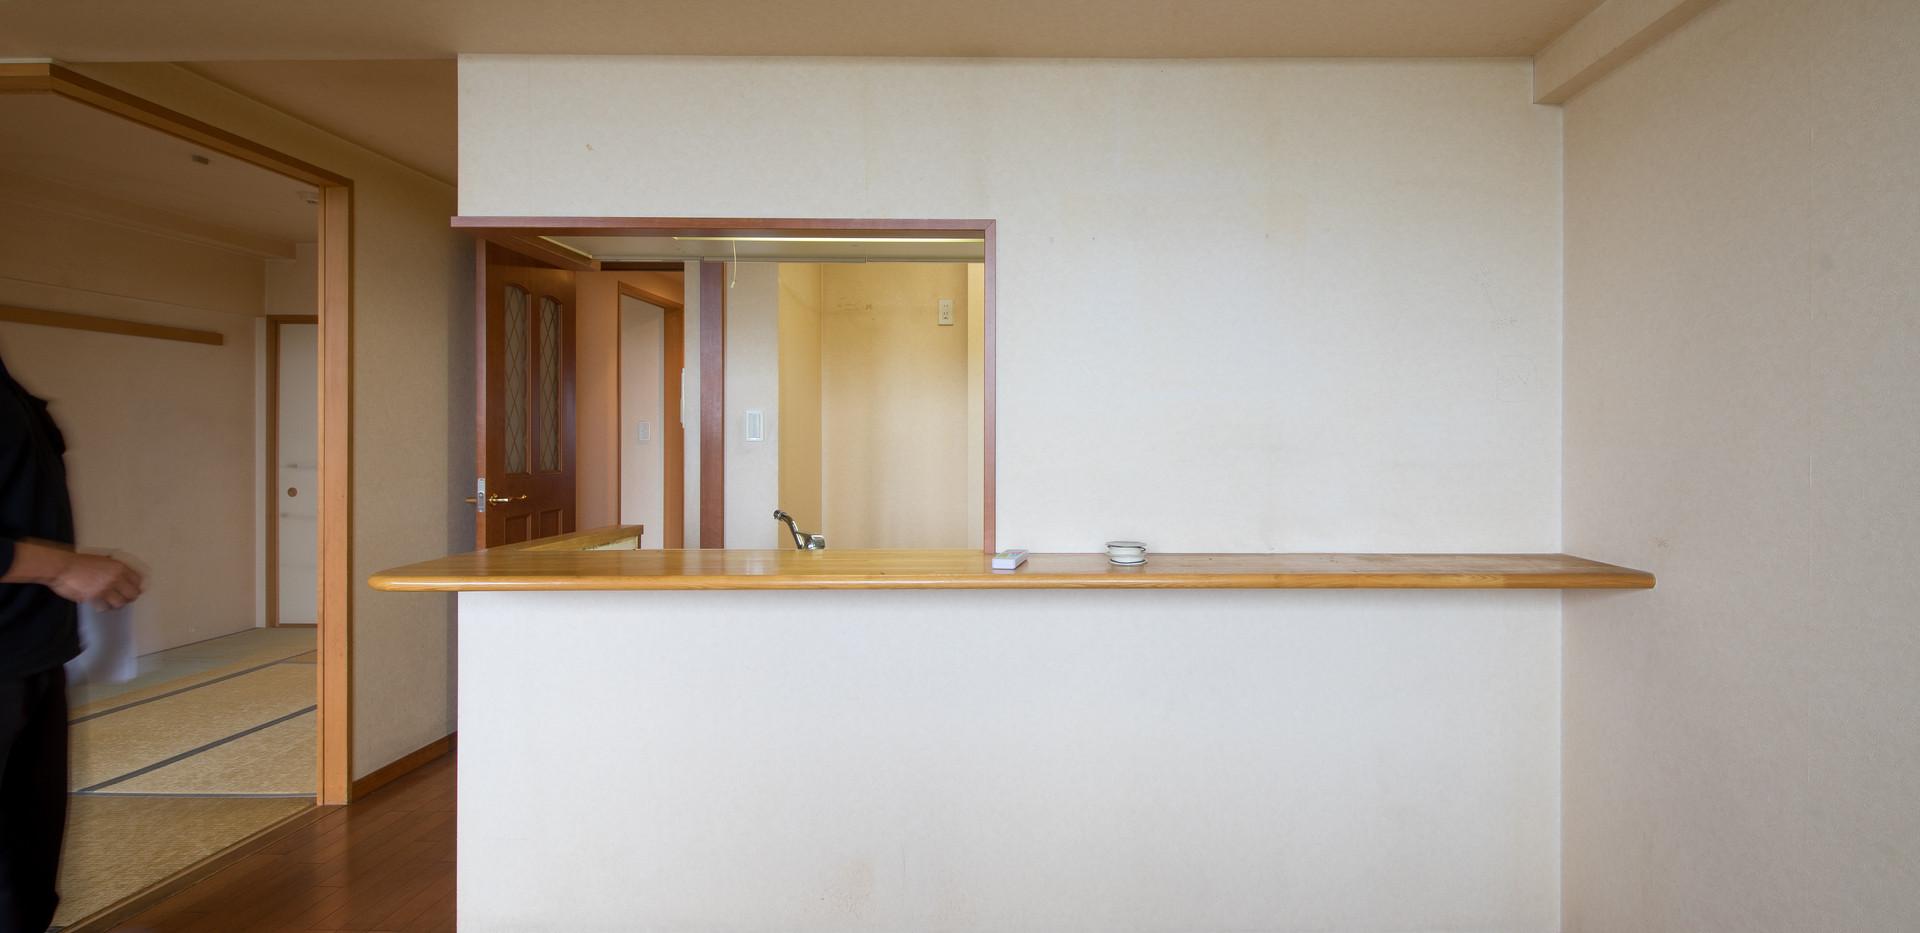 T様邸(草加市)-キッチン前-B.jpg